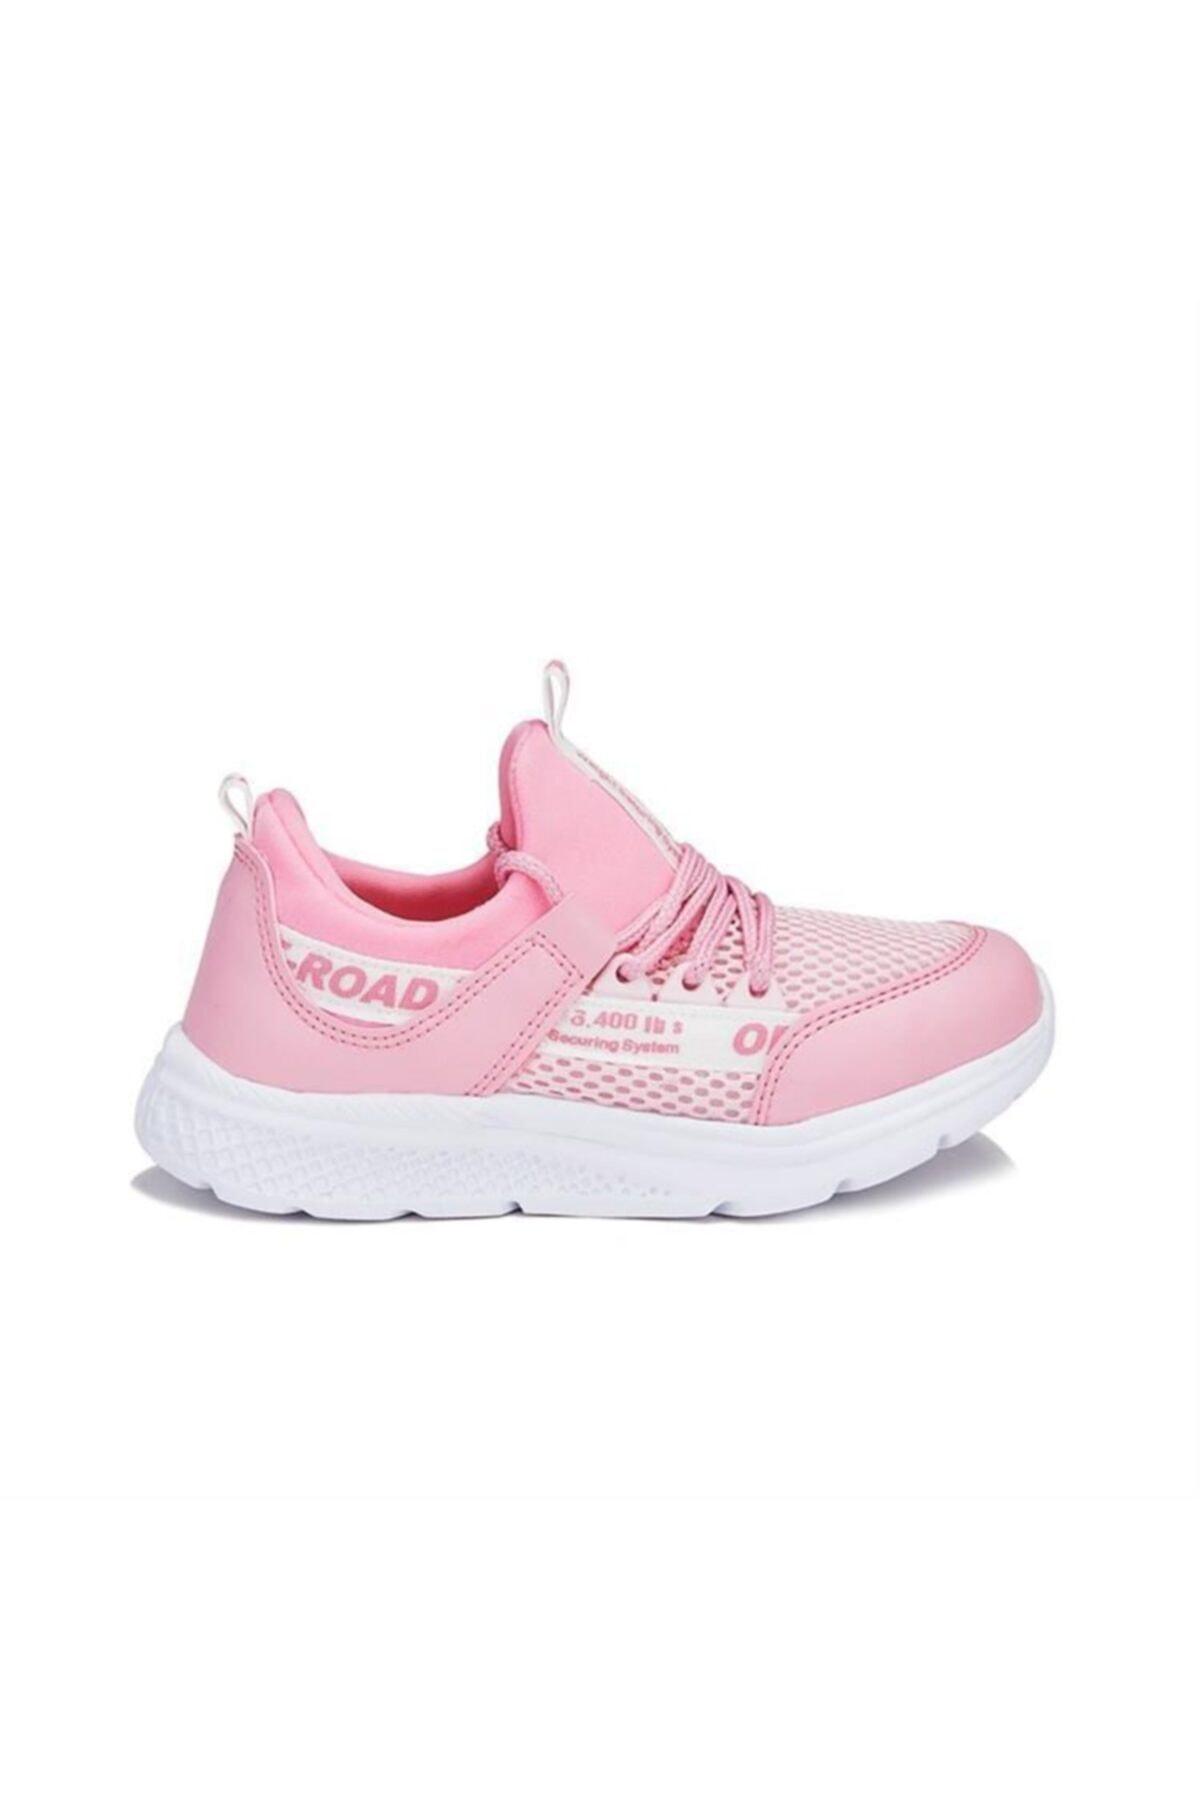 Vicco Ajax Pembe Kız Çocuk Spor Ayakkabı 346.f20y.514 1